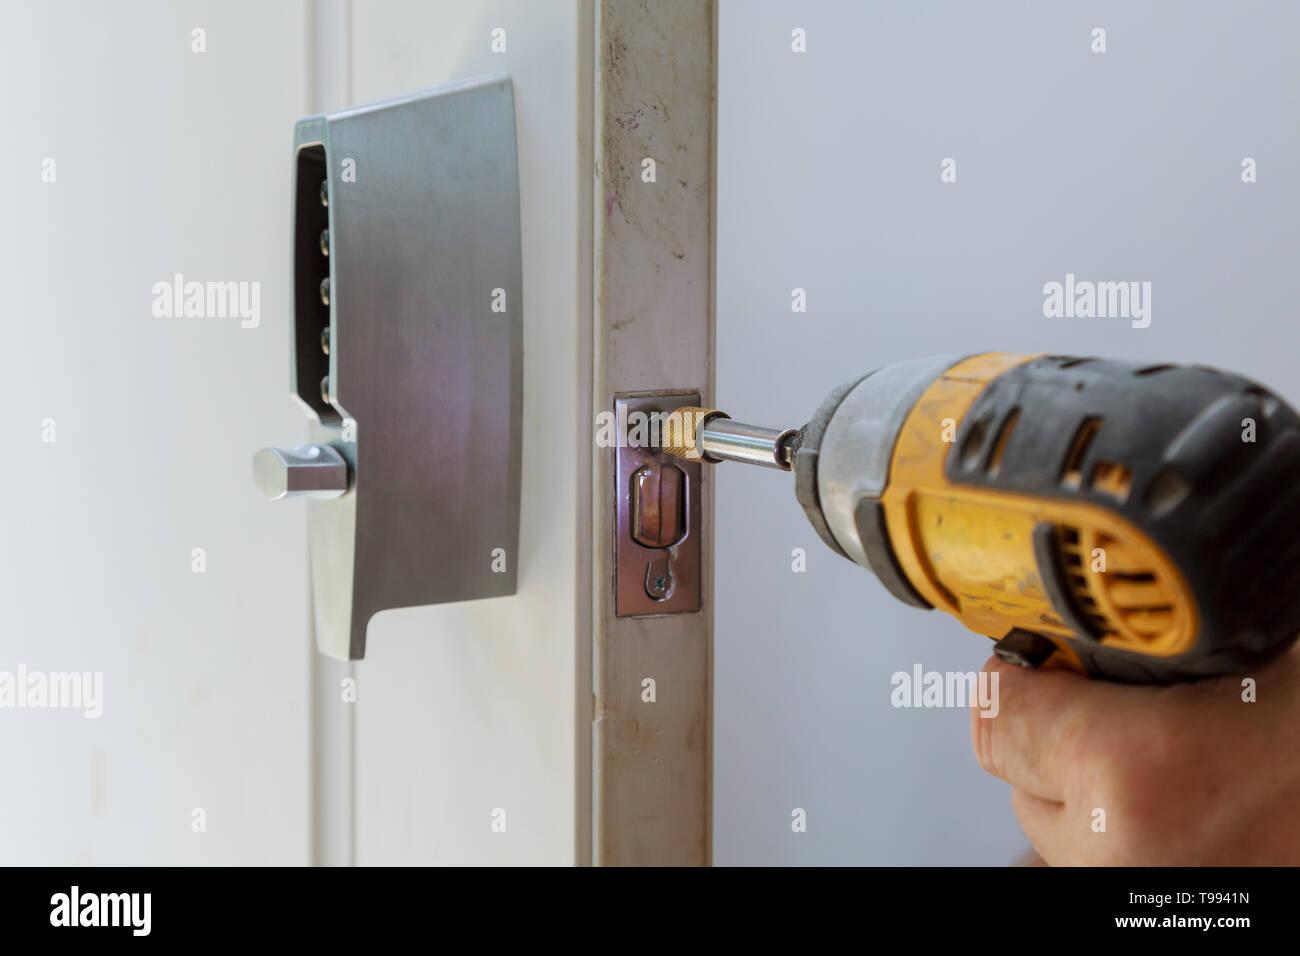 Rear view of repairman installing of the door lock electronic key - Stock Image